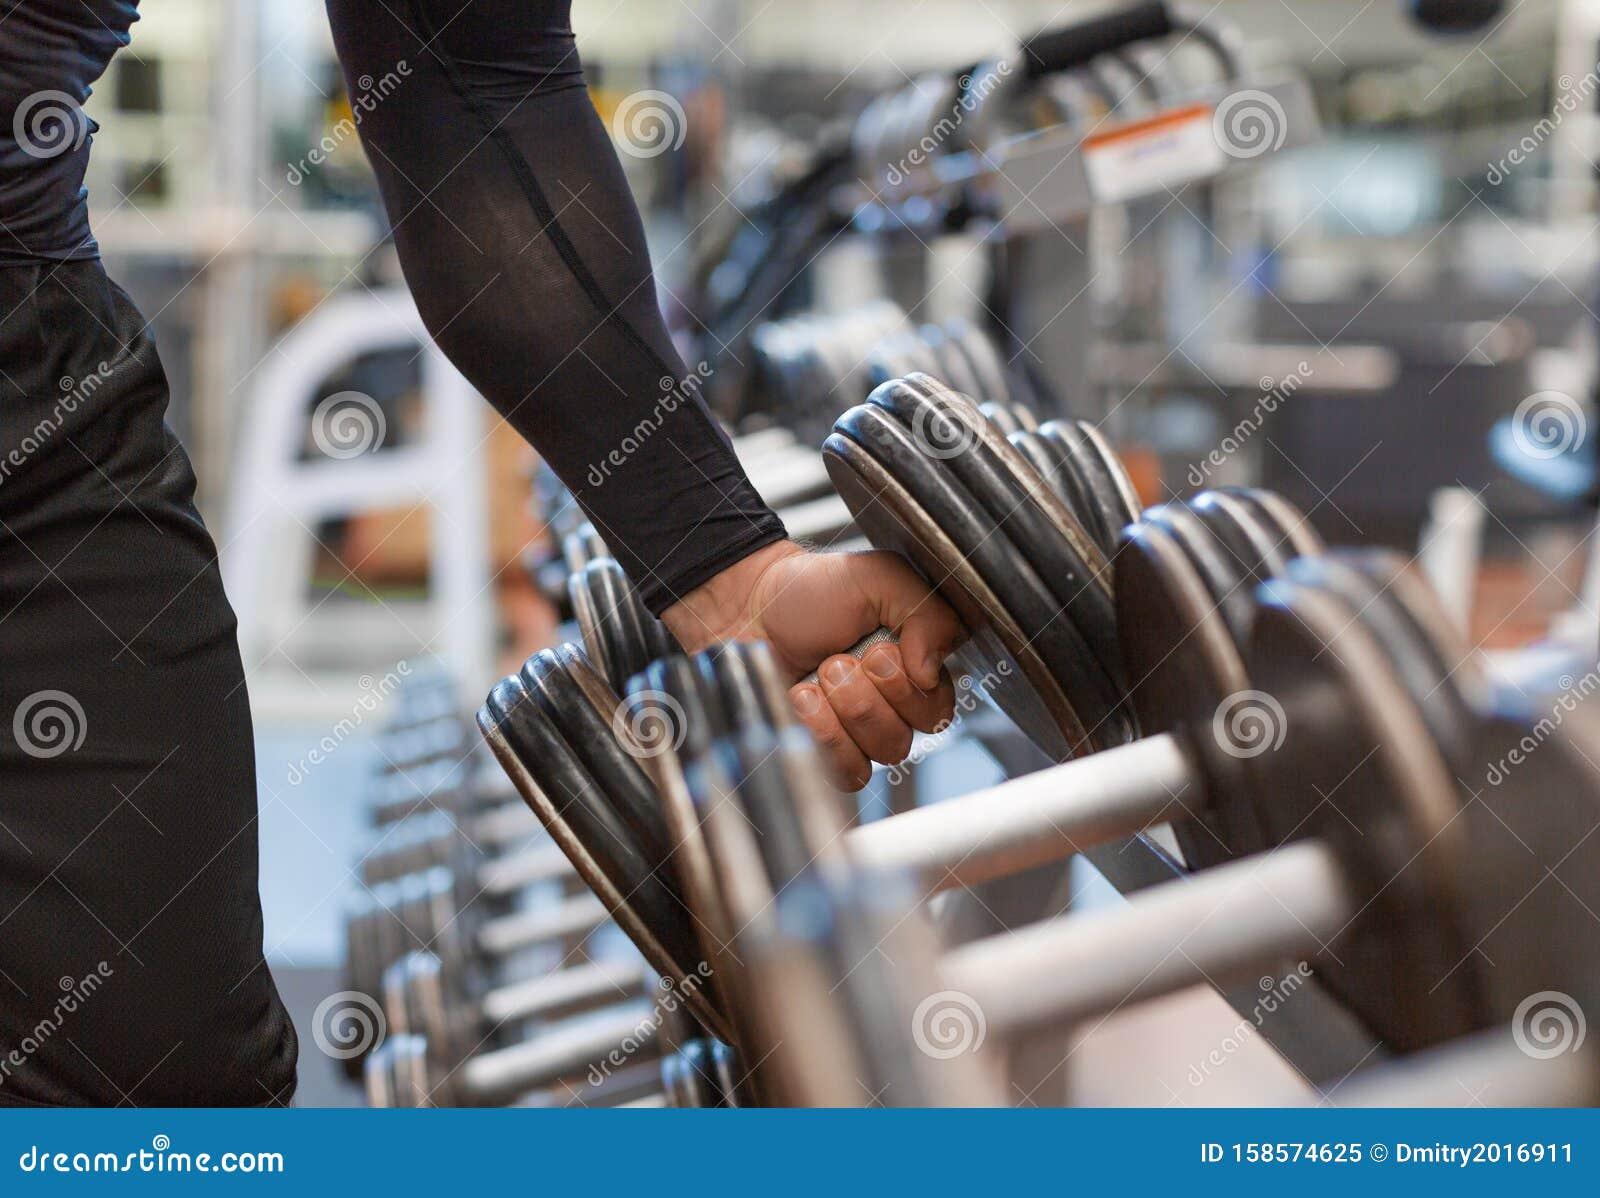 Free stock photo of bodybuilding, close-up, dumbbells